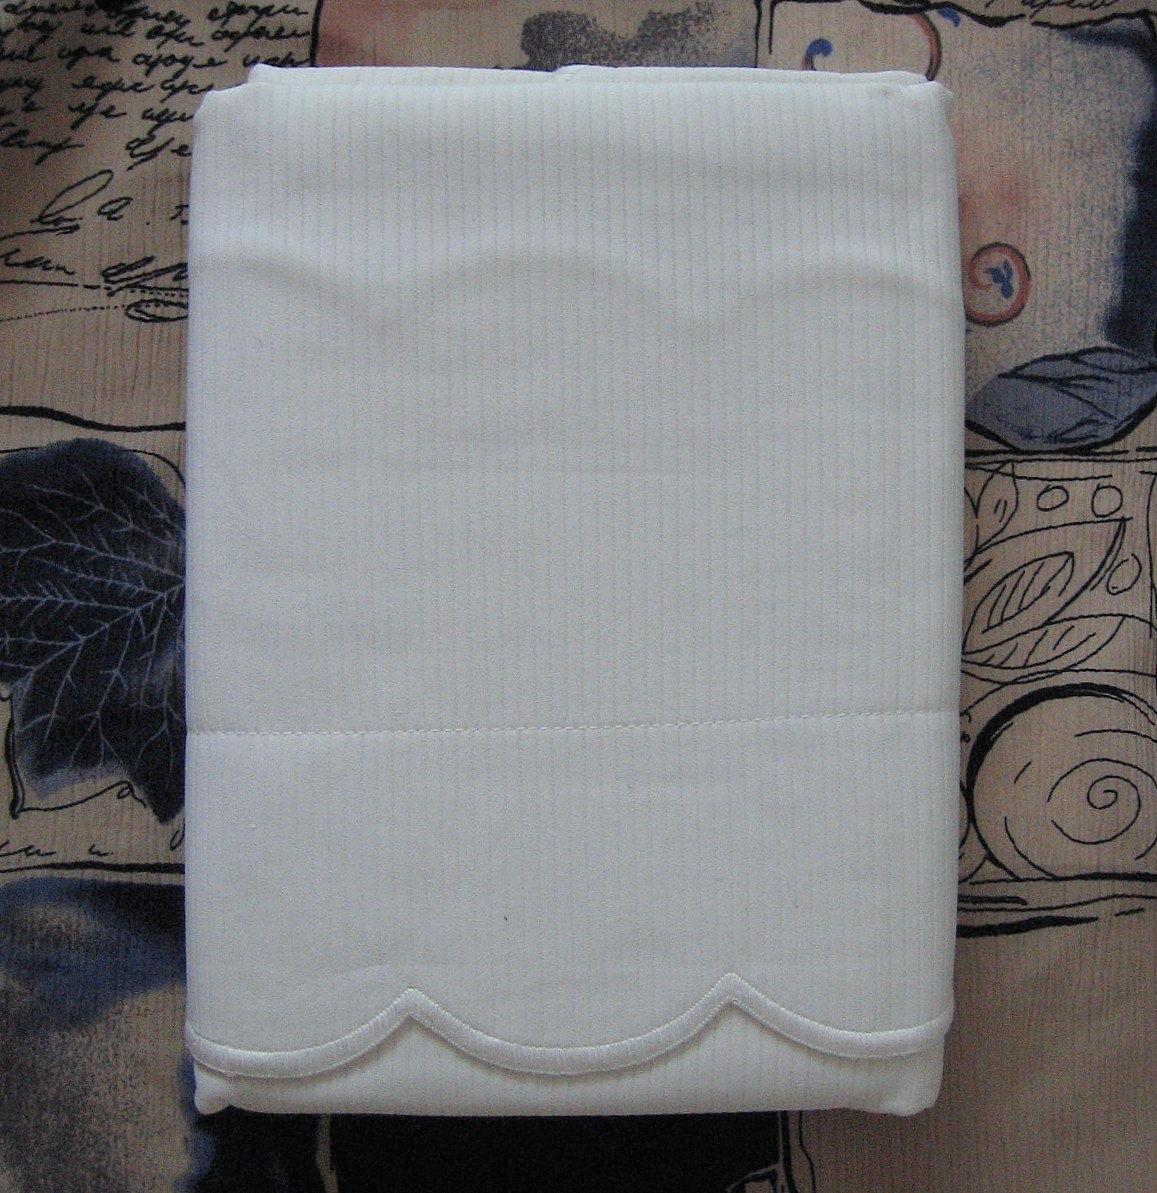 Ralph Lauren Jacquard Pillow Sham 100% White Cotton 50x66 CM Portugal #16387